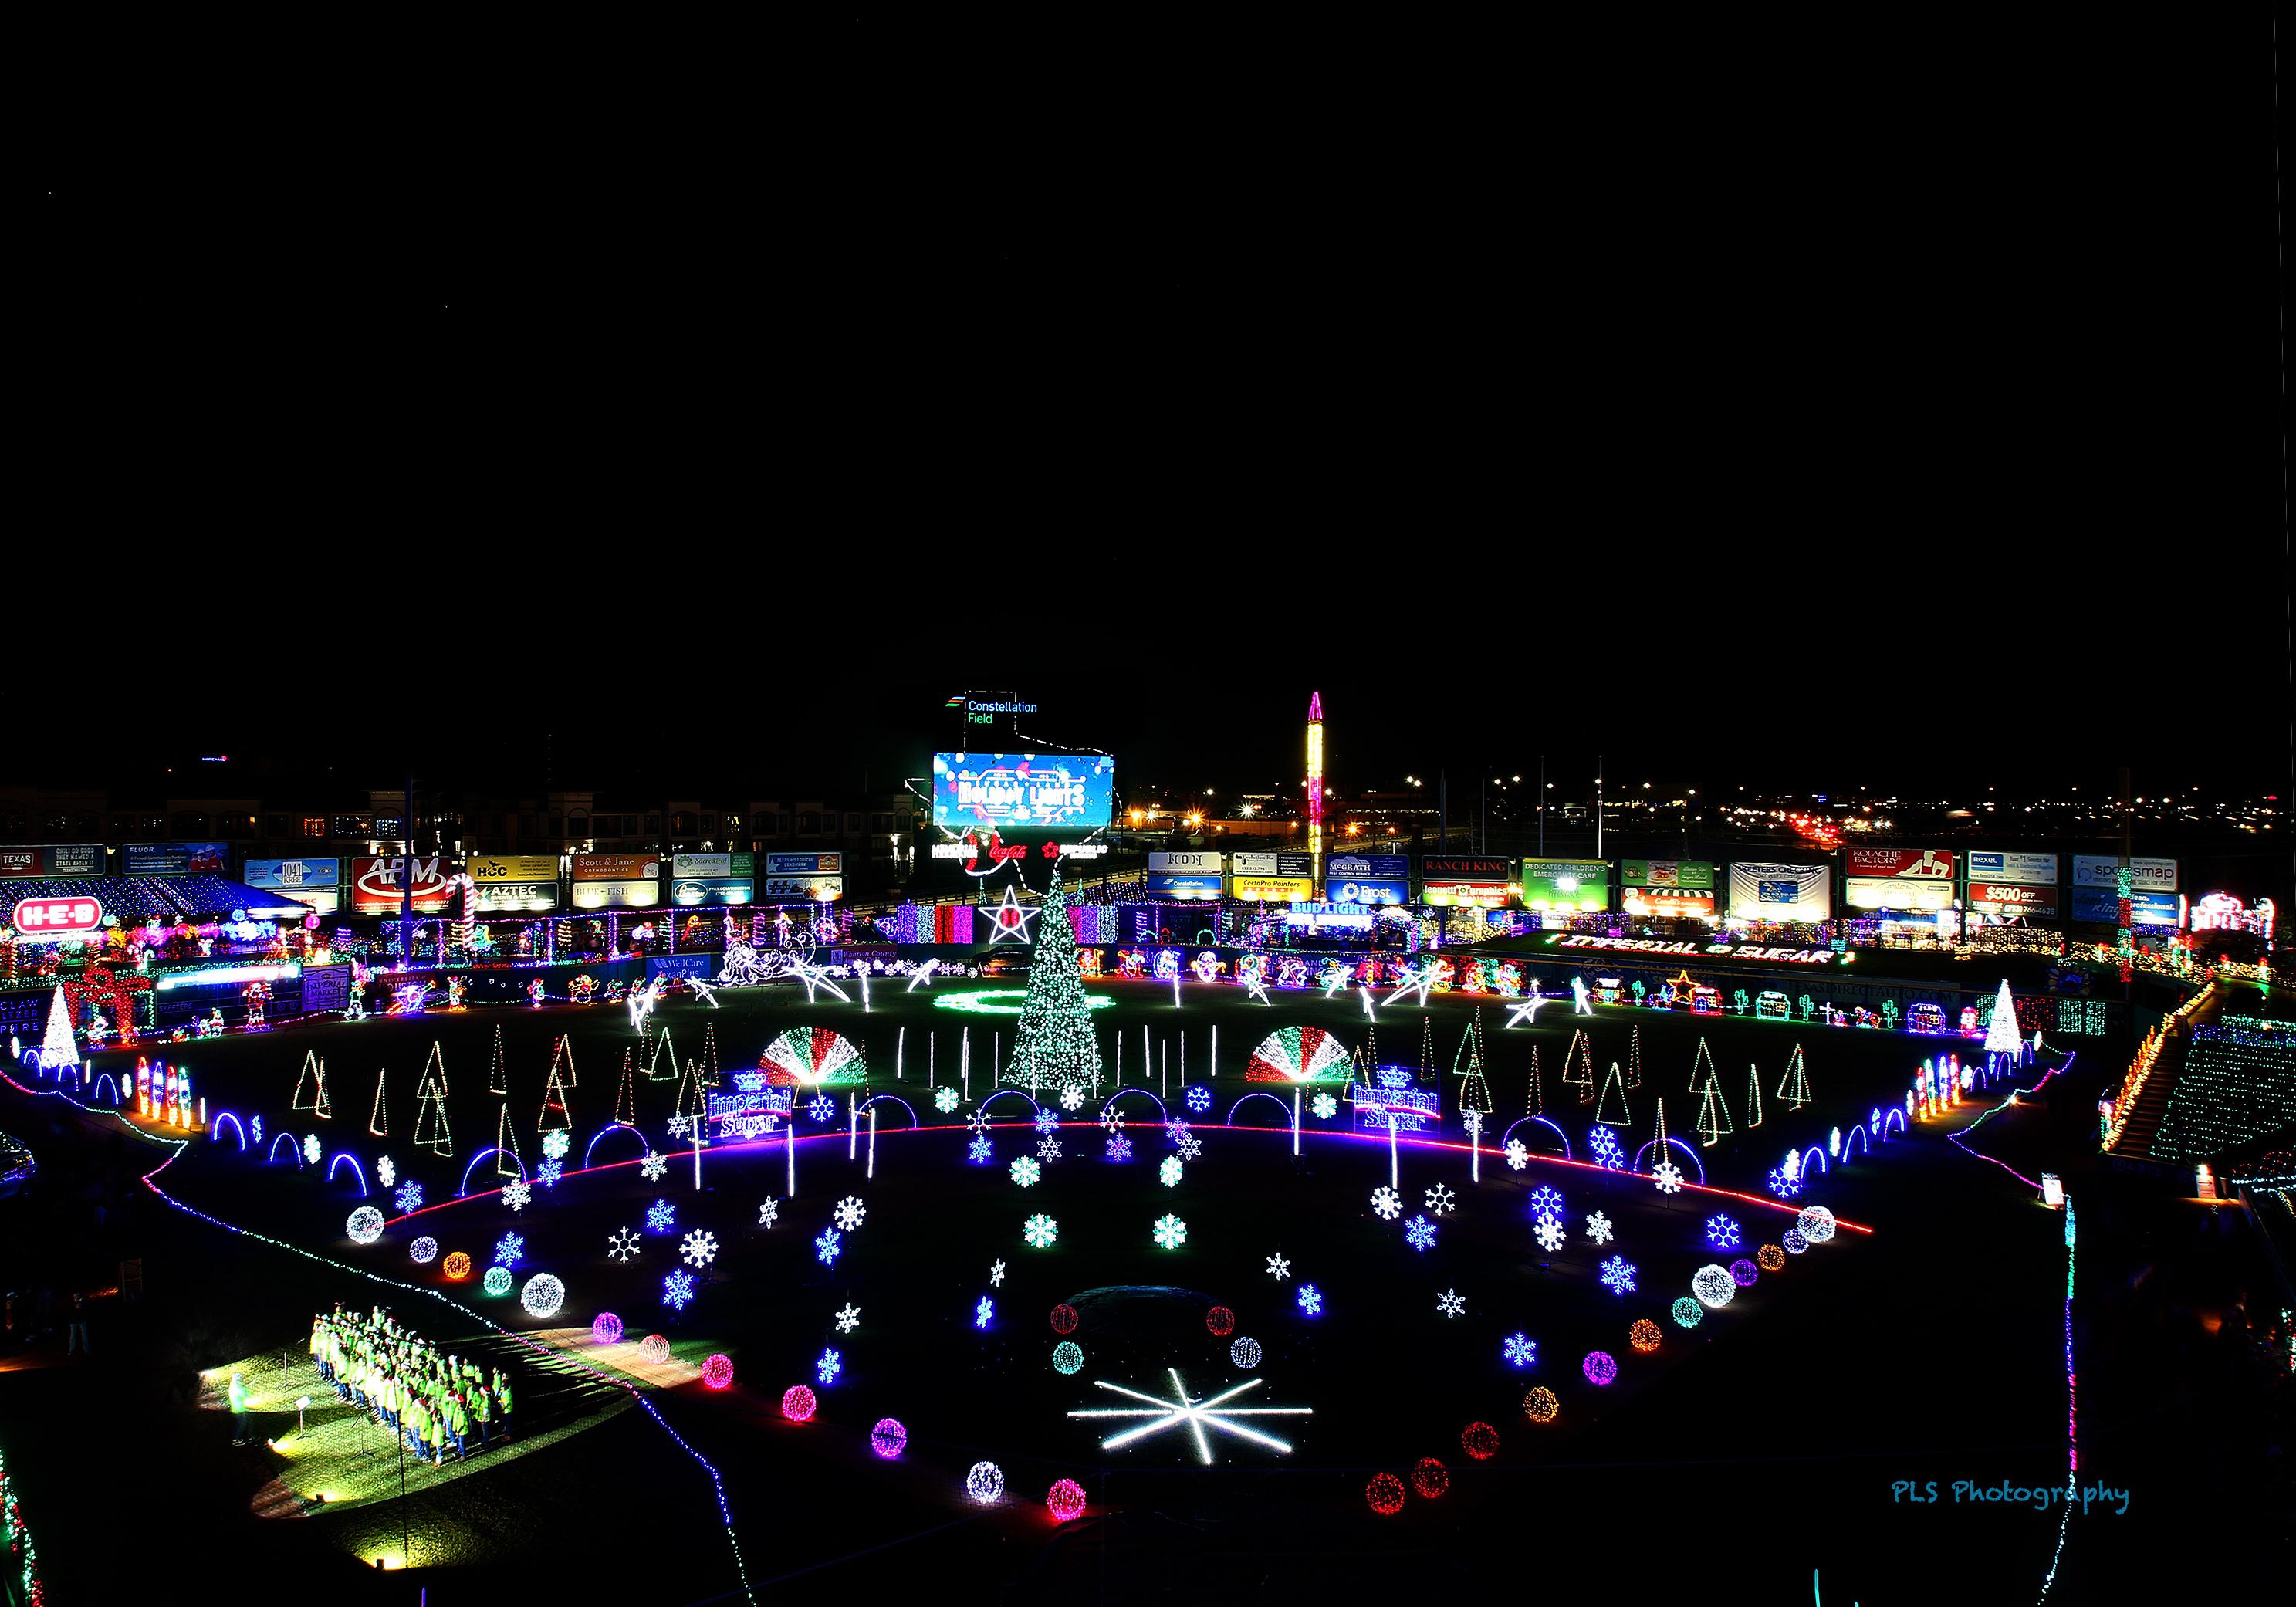 1 Holiday Lights Video Board From Roof. PLS18141.jpg